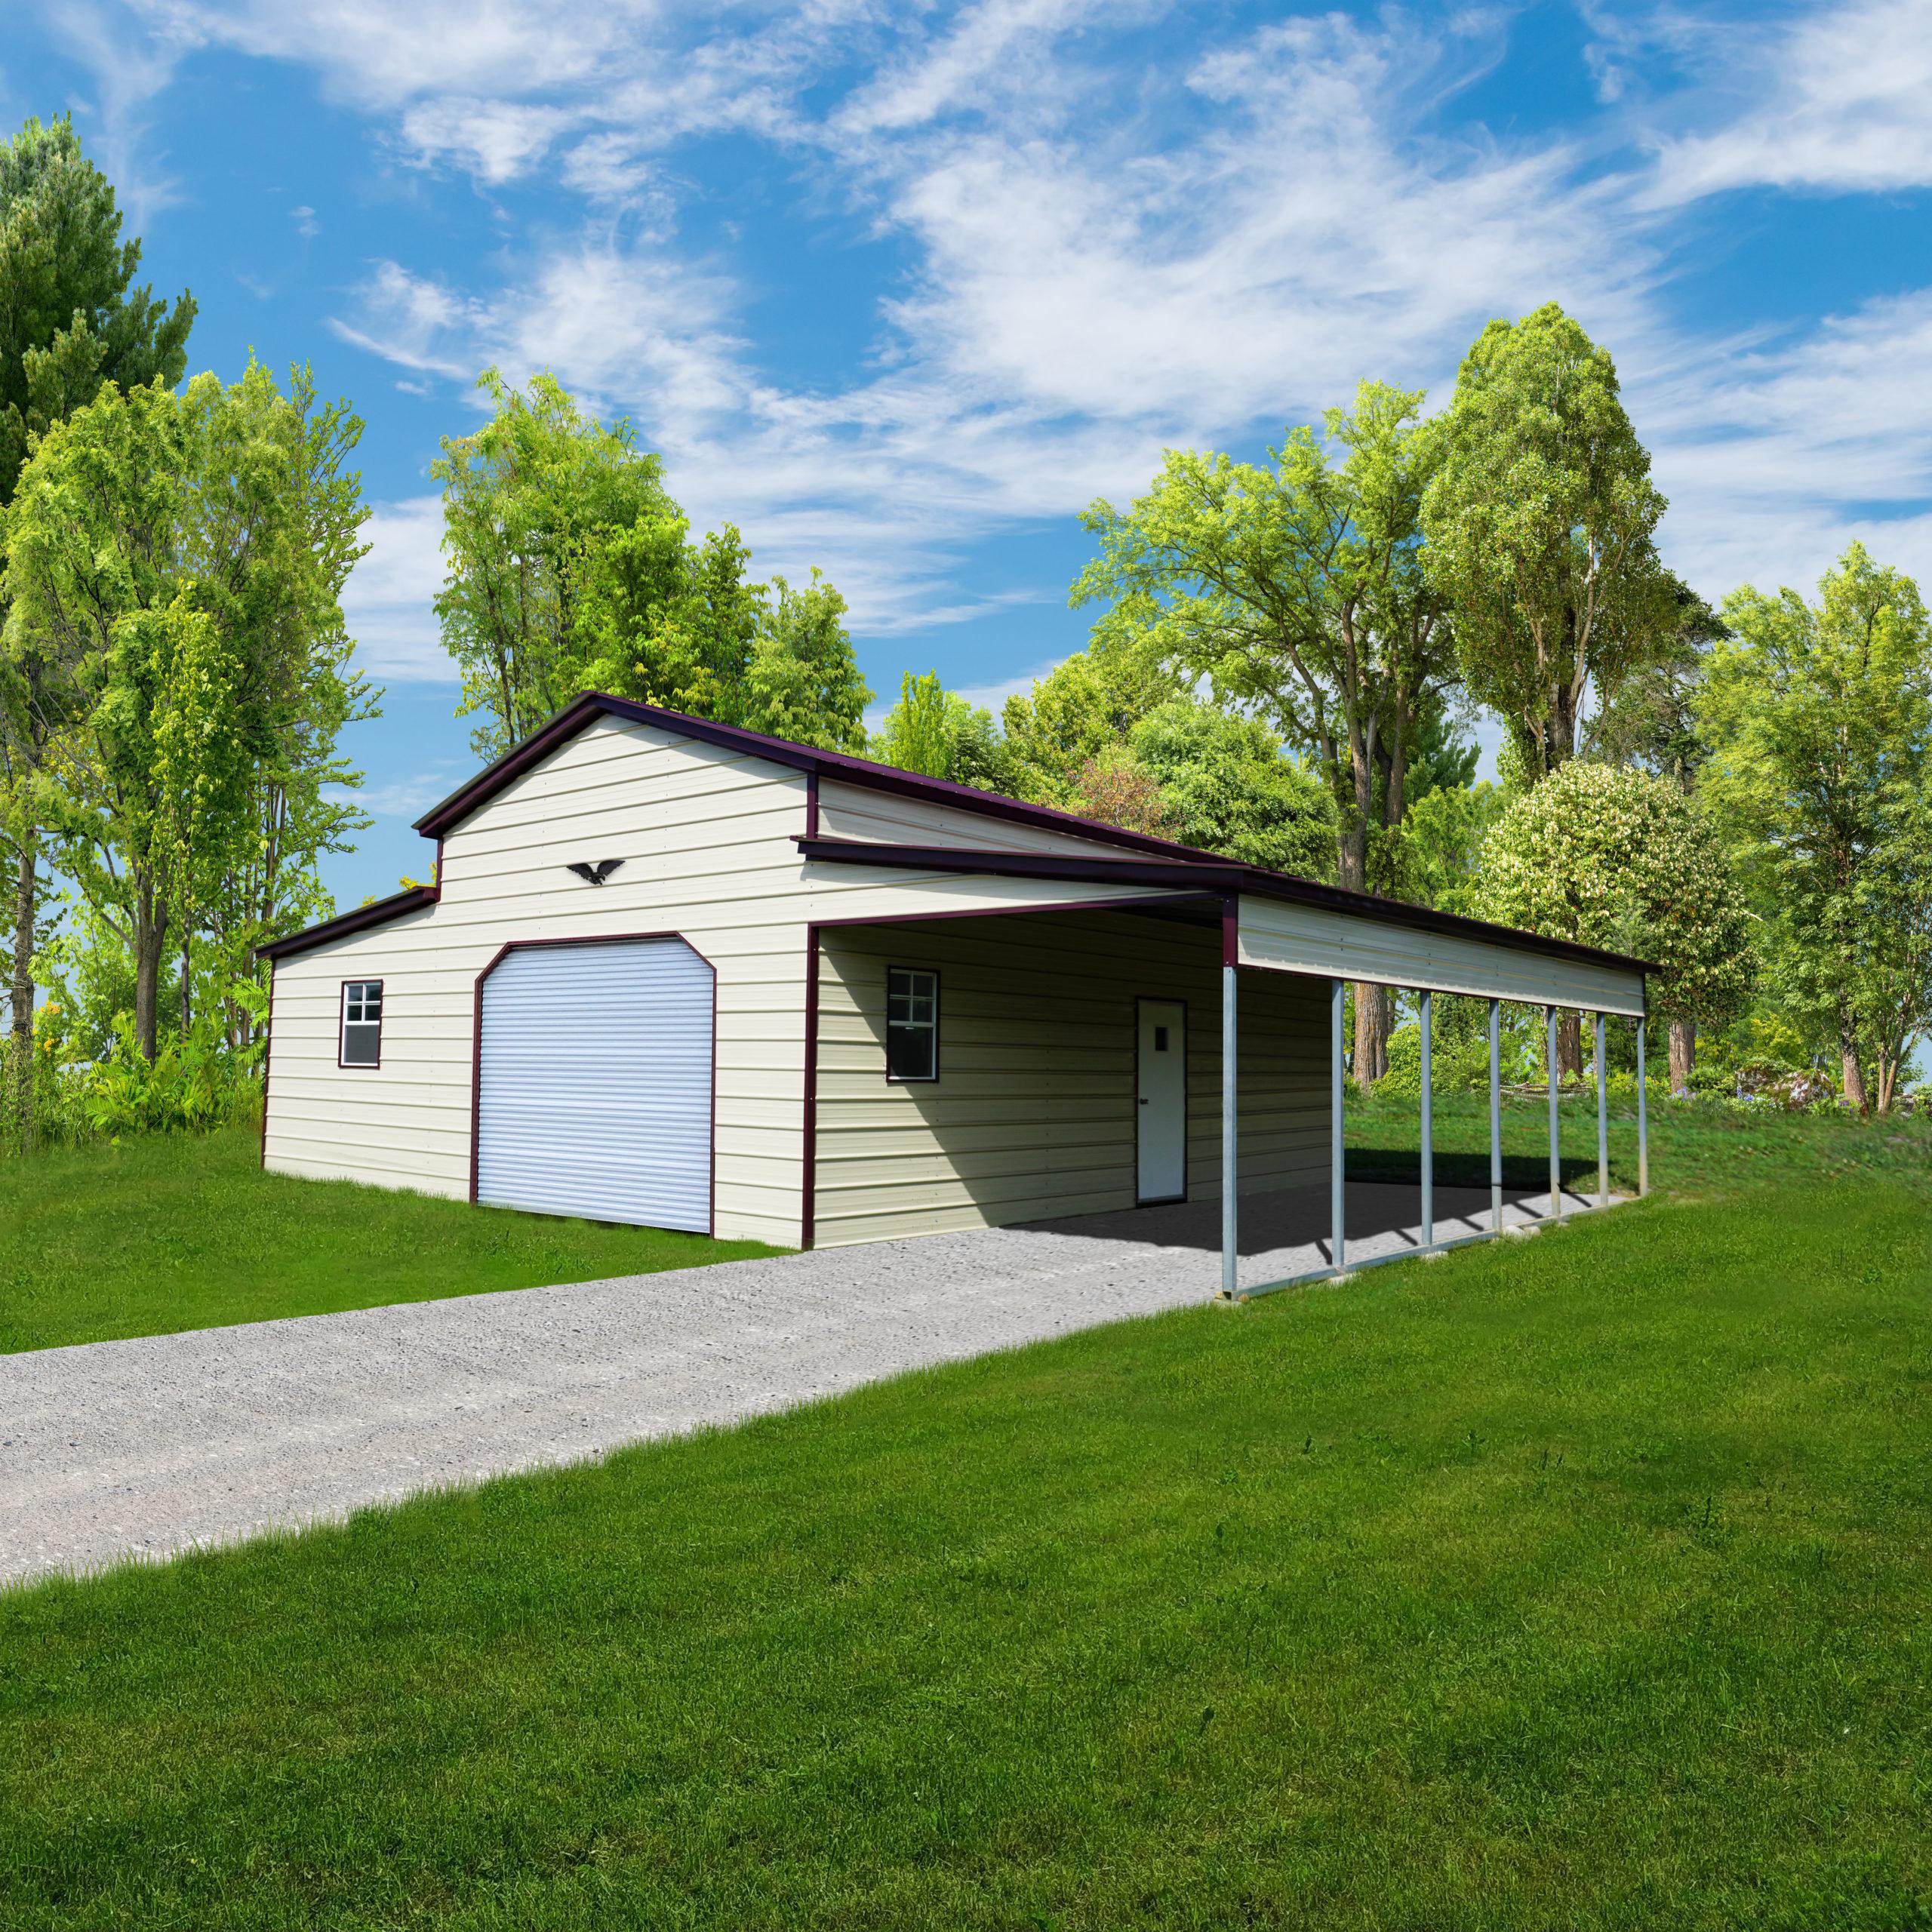 Metal Vertical Enclosed Horse Barn  32 x 31 x 12 x 8